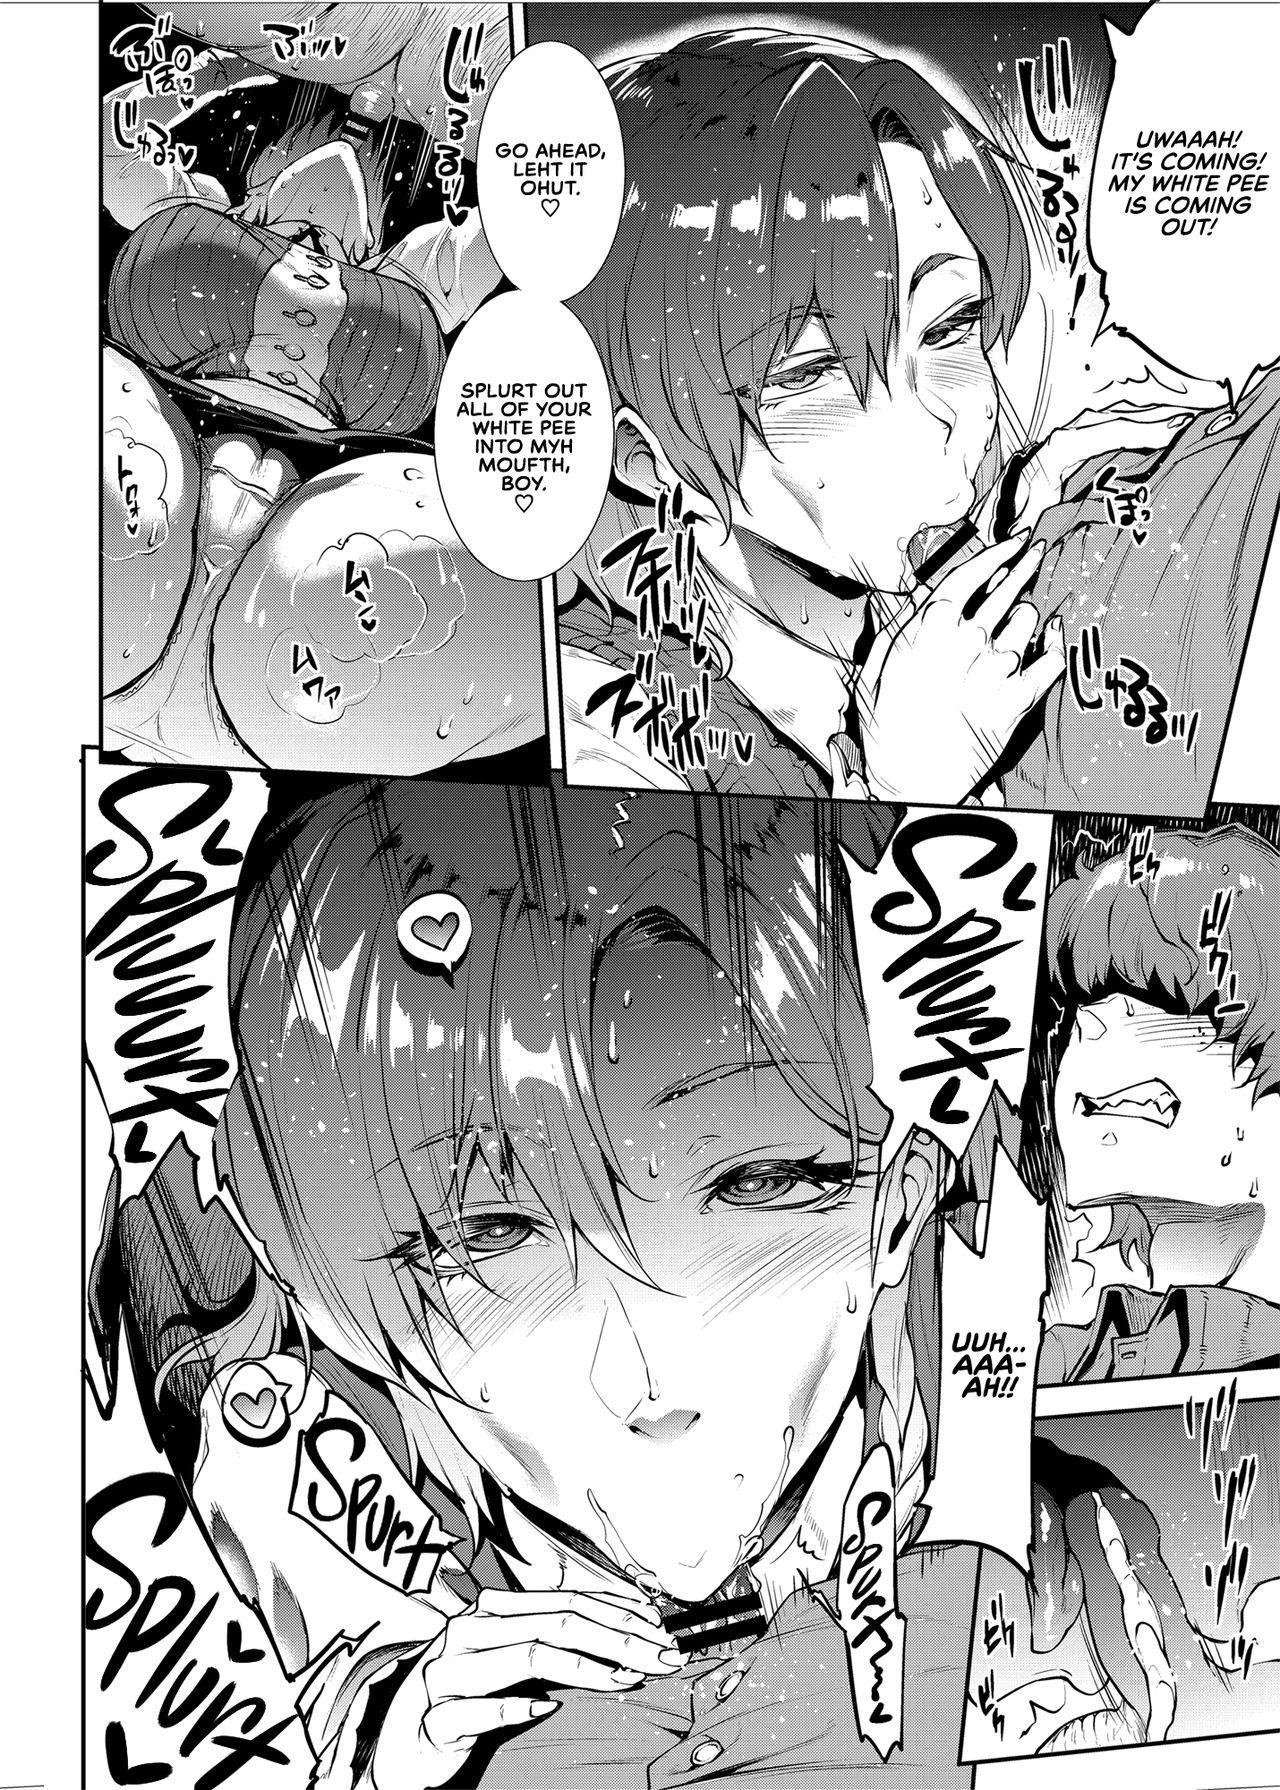 [ERECT TOUCH (Erect Sawaru)] Flower Vendor ~Hanauri Onee-san ni Yasashiku Fudeoroshi~ | Flower Vendor ~Gently Losing My Virginity To Miss Flower Vendor~ [English] [RedLantern] 19